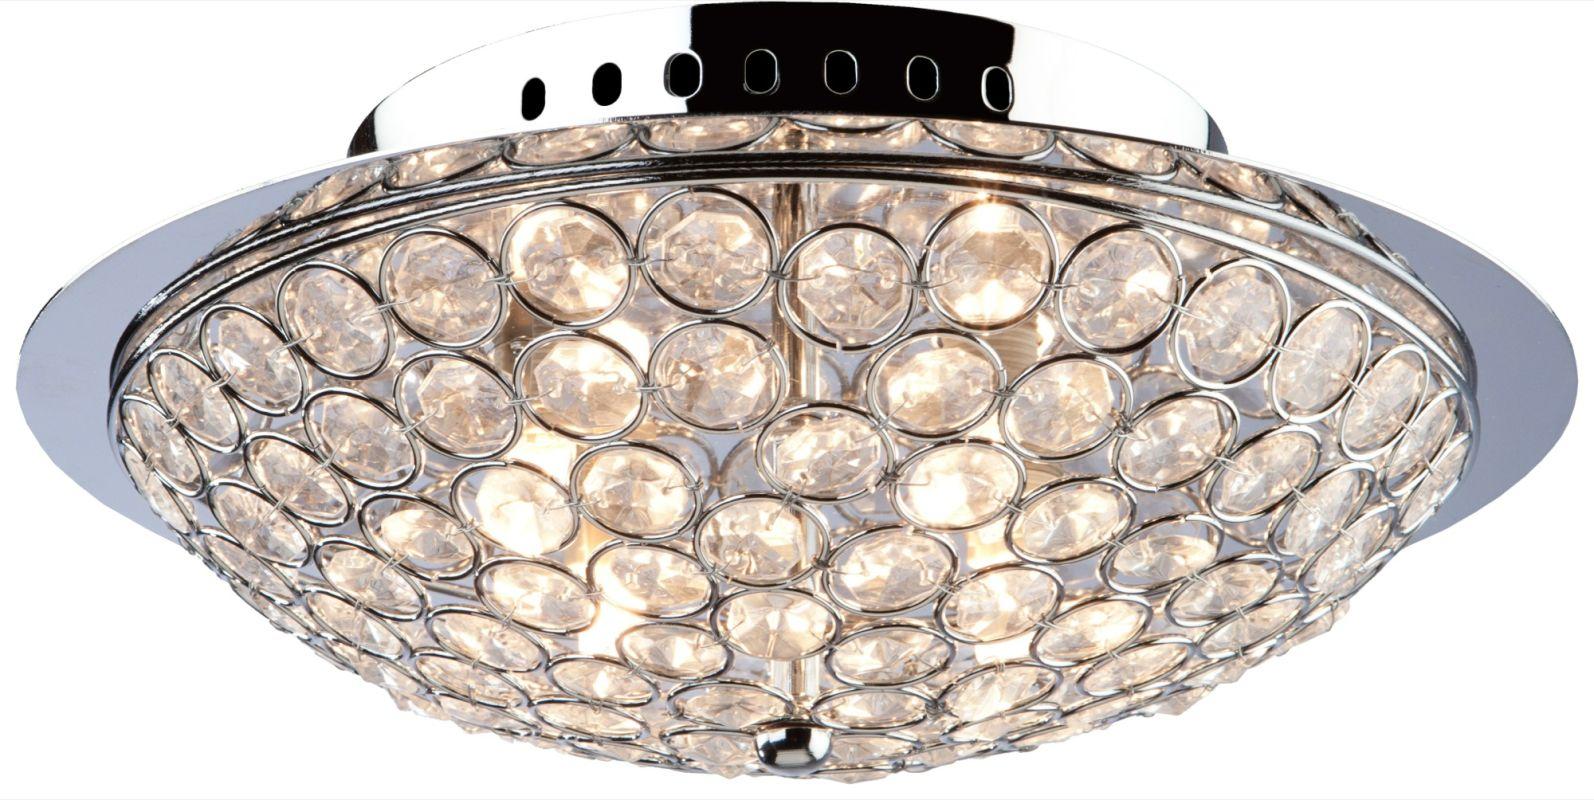 Artcraft Lighting AC10101 Gage Park 4 Light Flush Mount Ceiling